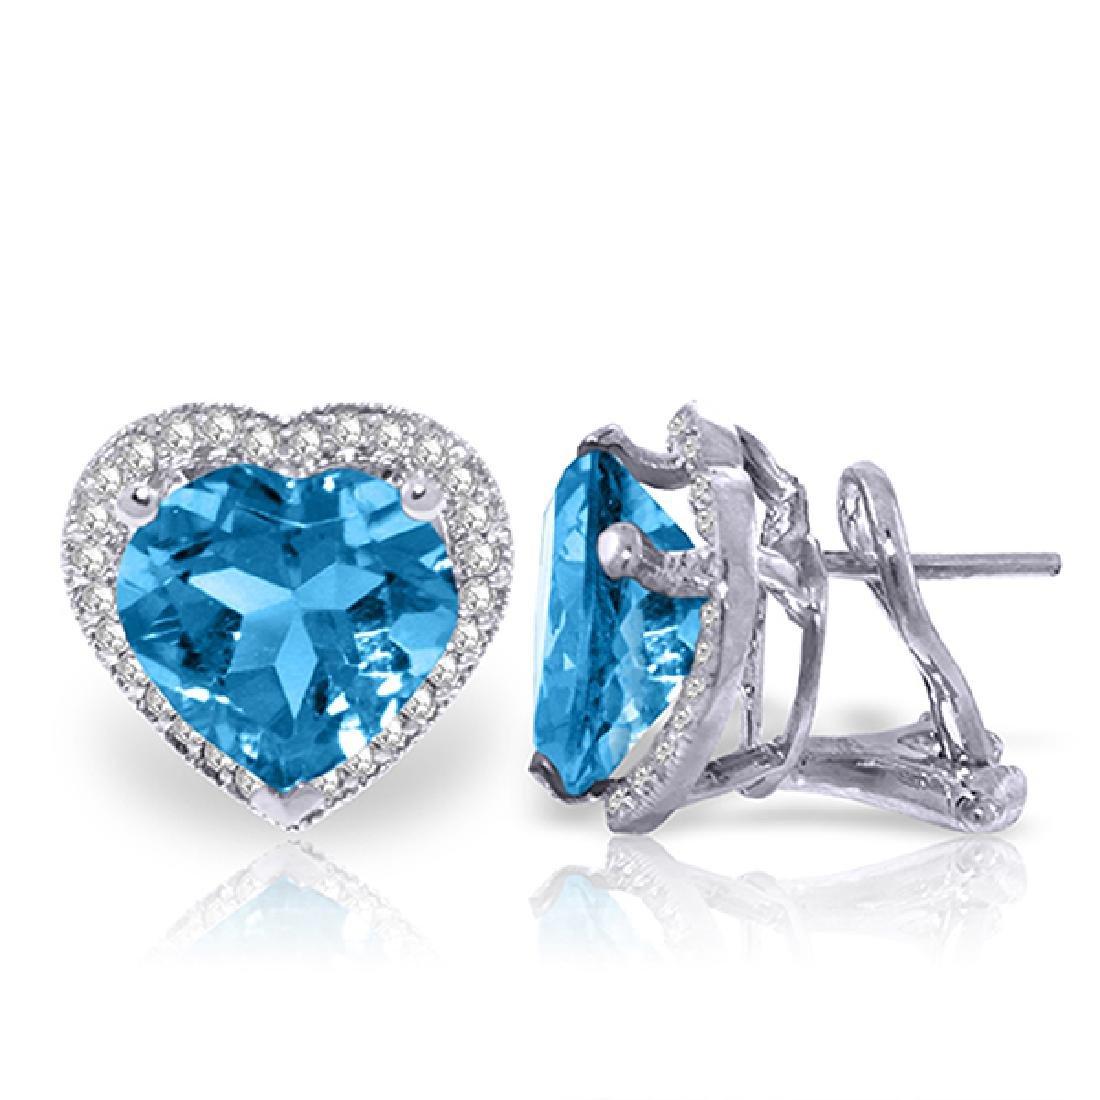 Genuine 12.88 ctw Blue Topaz & Diamond Earrings Jewelry